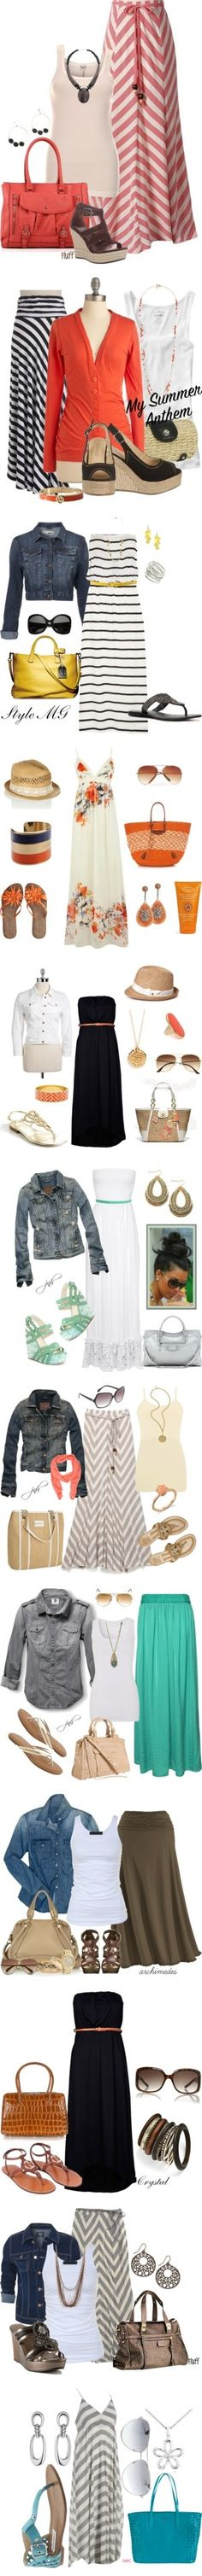 #summer maxi ideas  Maxi Dresses #2dayslook #MaxiDresses #sasssjane  www.2dayslook.com